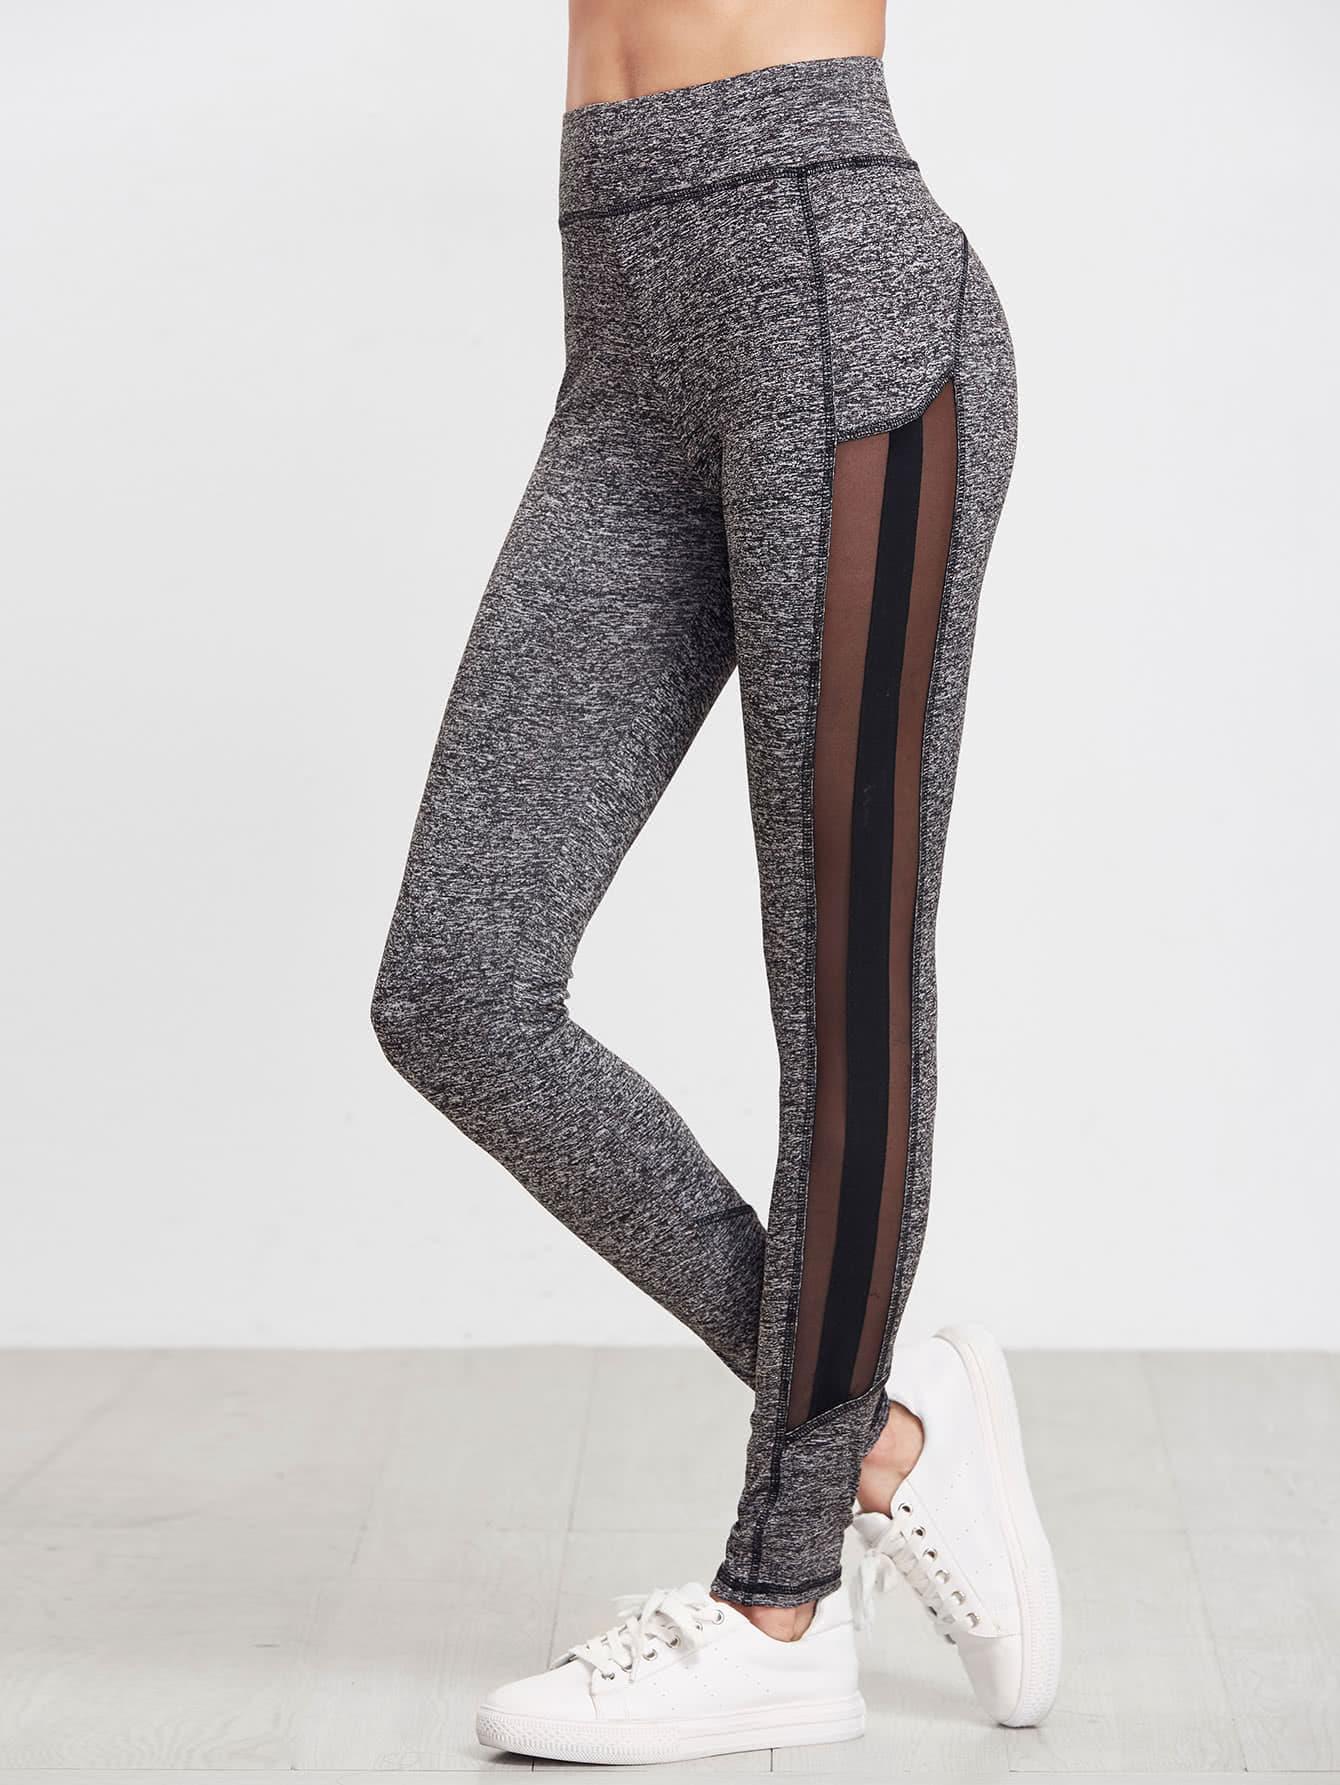 Marled Knit Mesh Panel Leggings marled knit topstitch stirrup leggings